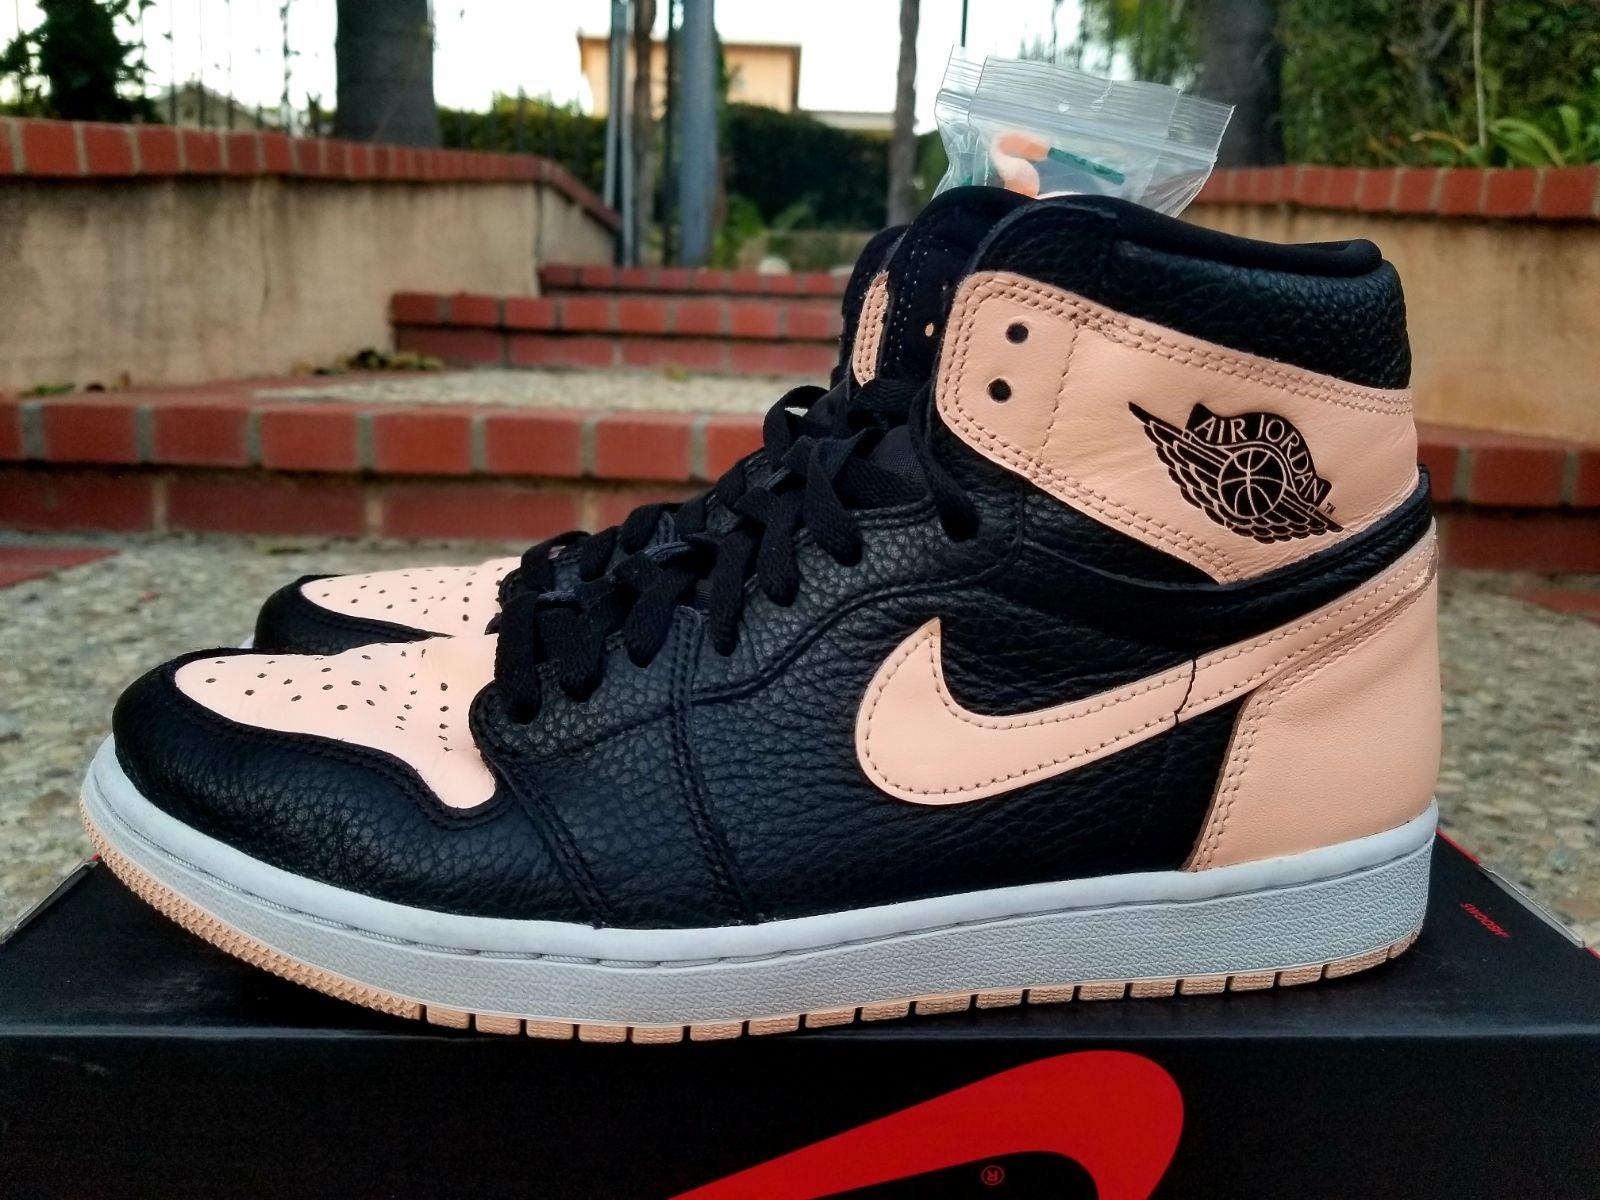 Nike Air Jordan 1 High Crimson Tint